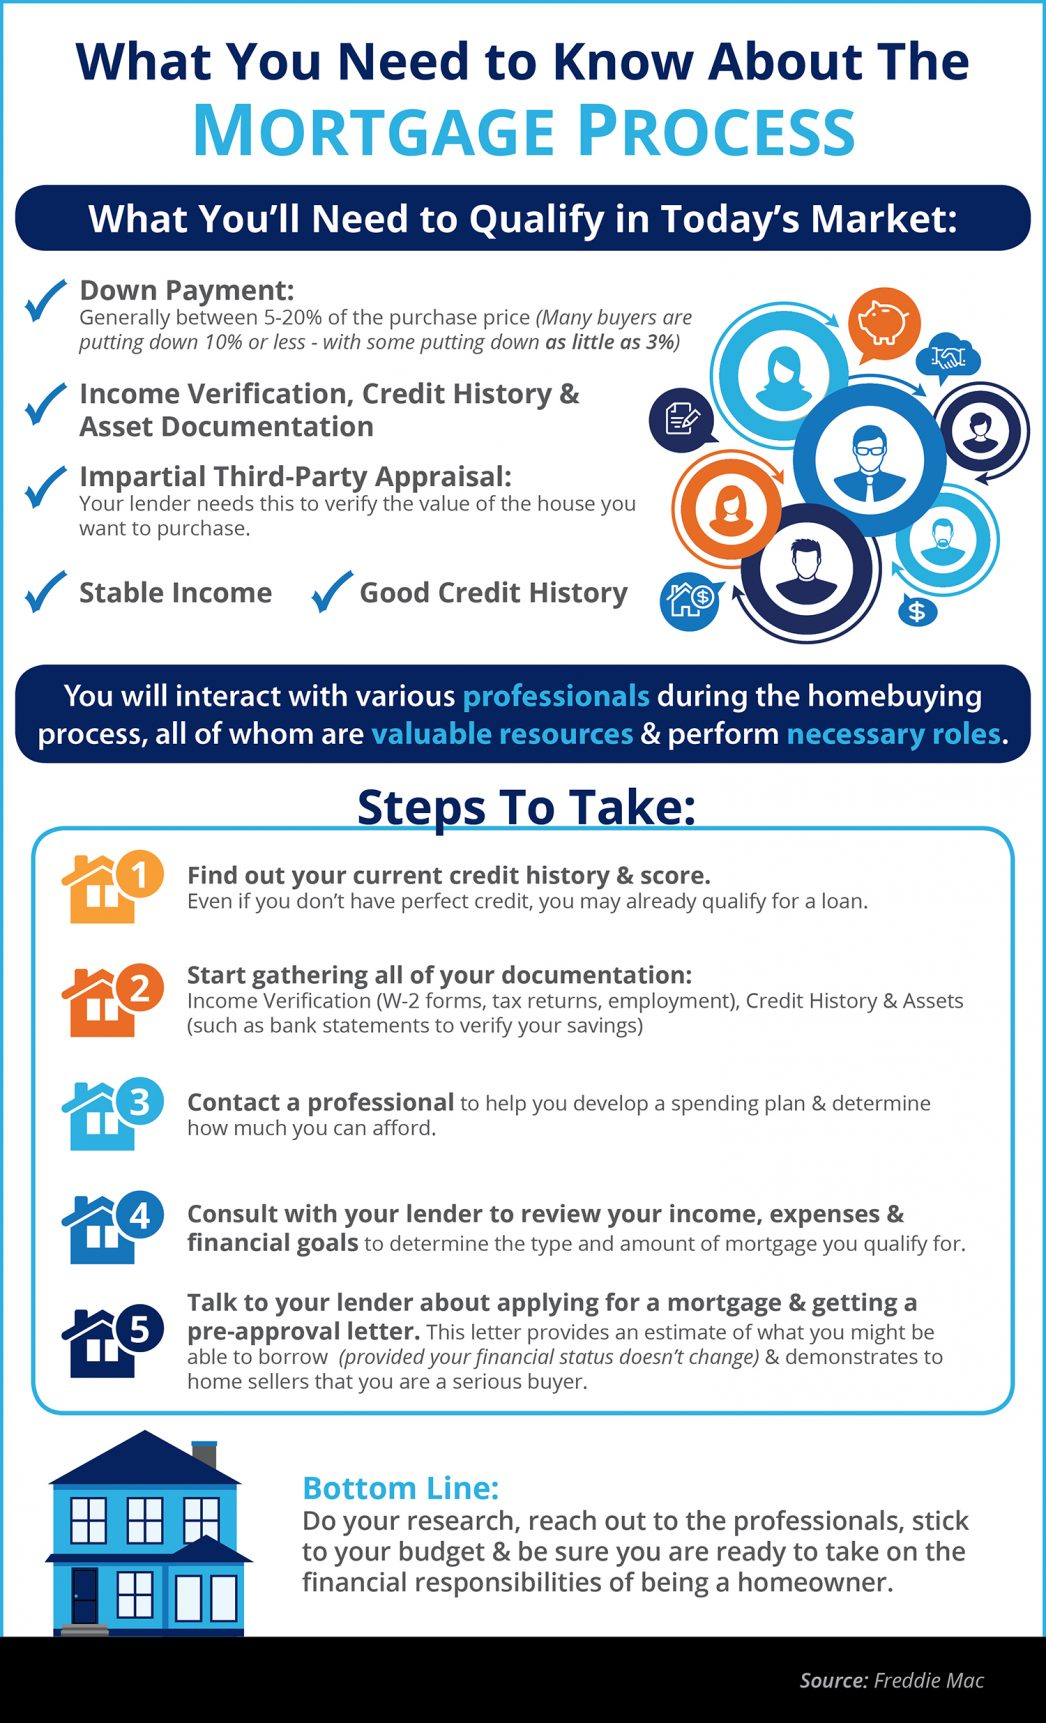 baton rouge mortgage process